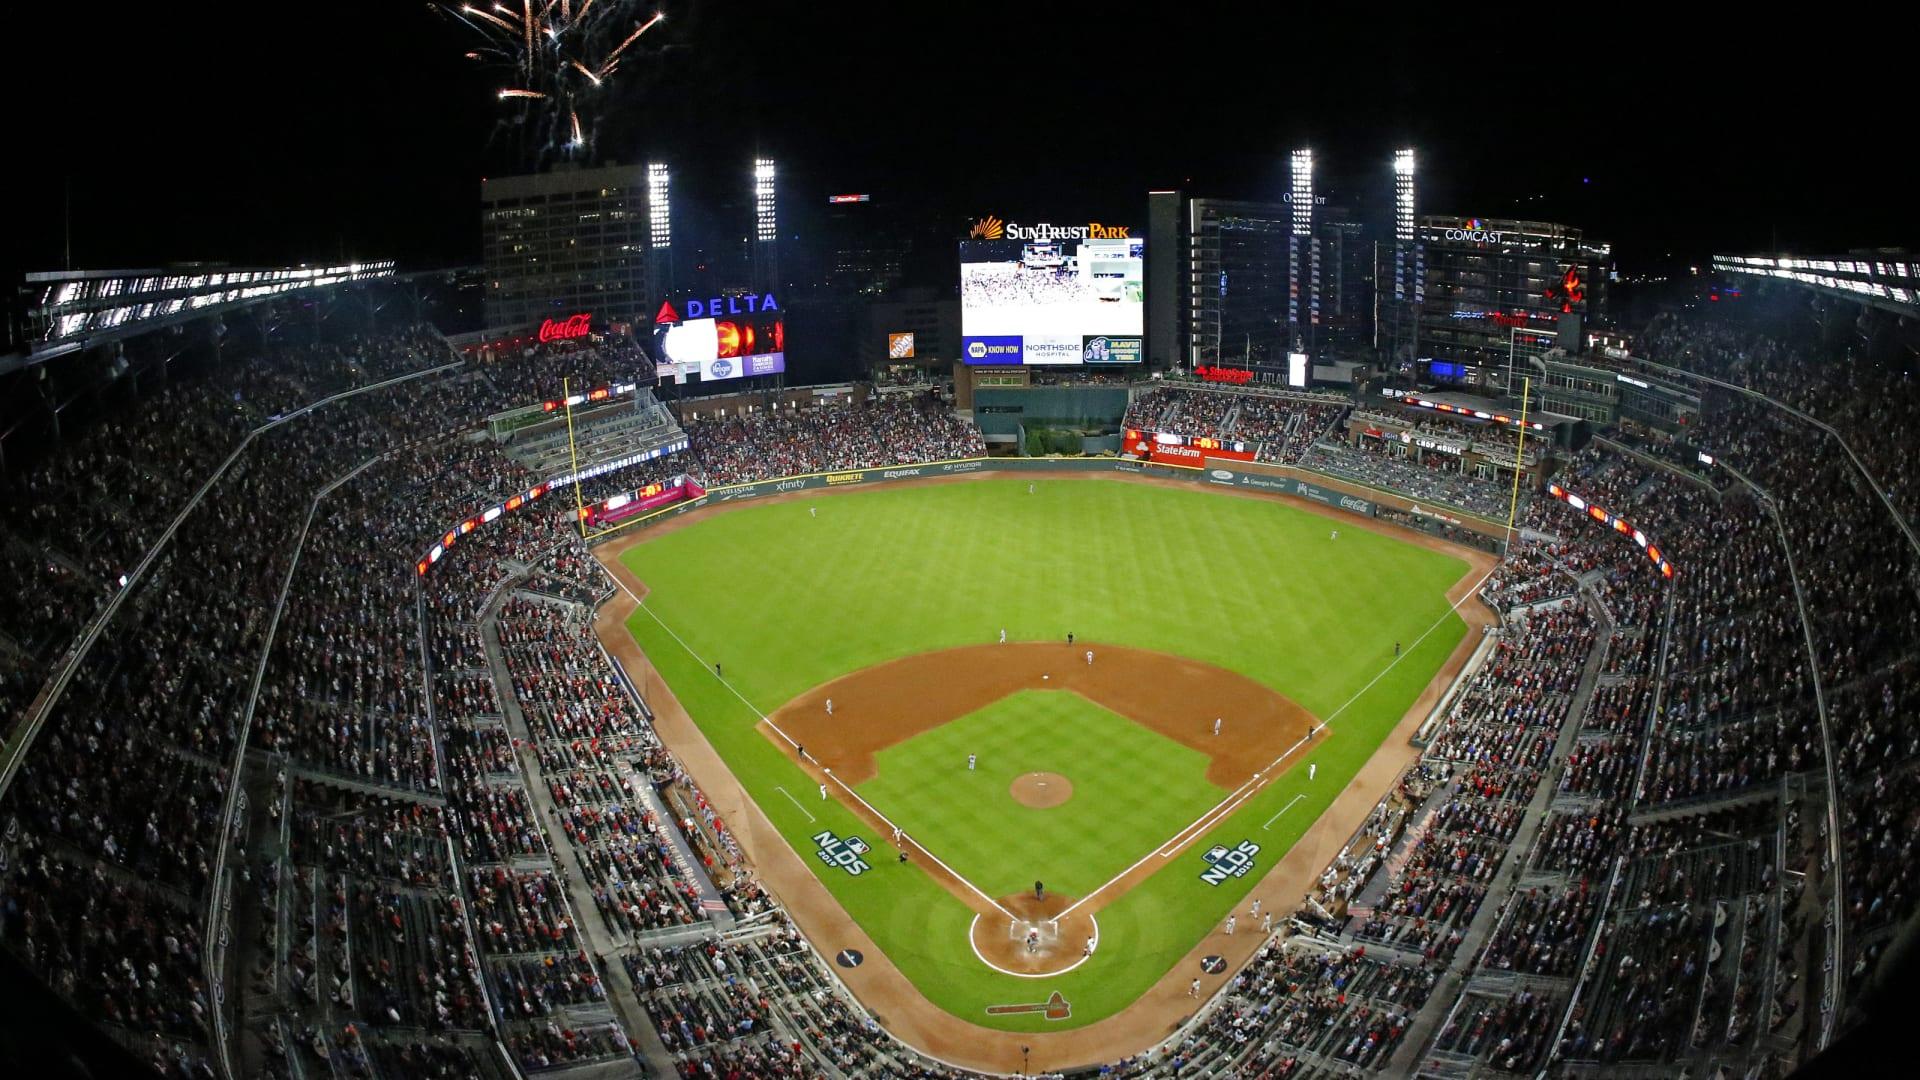 Atlanta Braves chop: Update COVID-19 news and negotiationsAtlanta Braves